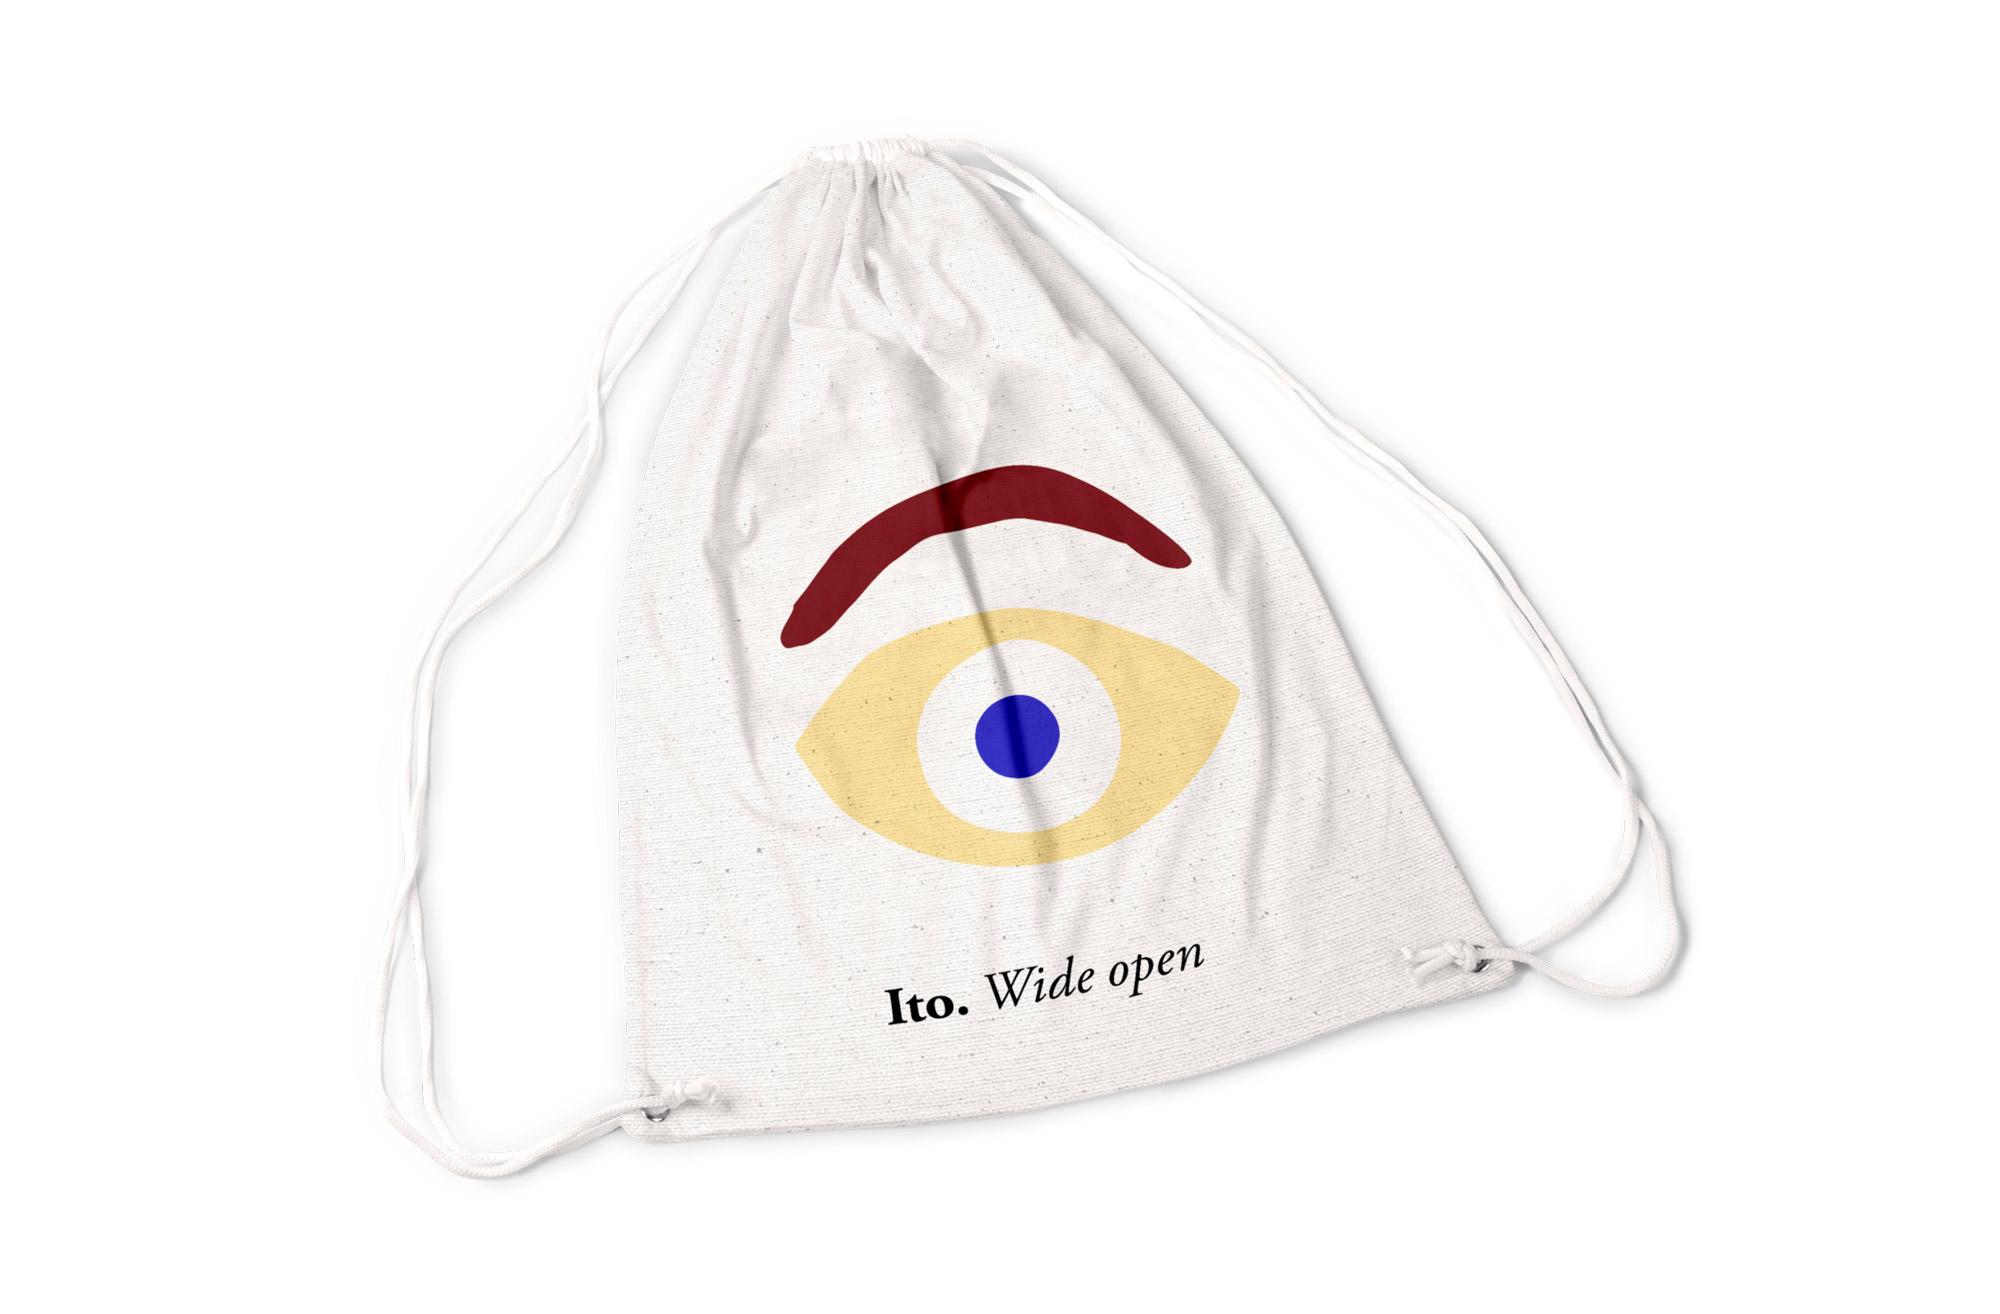 Vlevle-Ito-sportbag-2.jpg